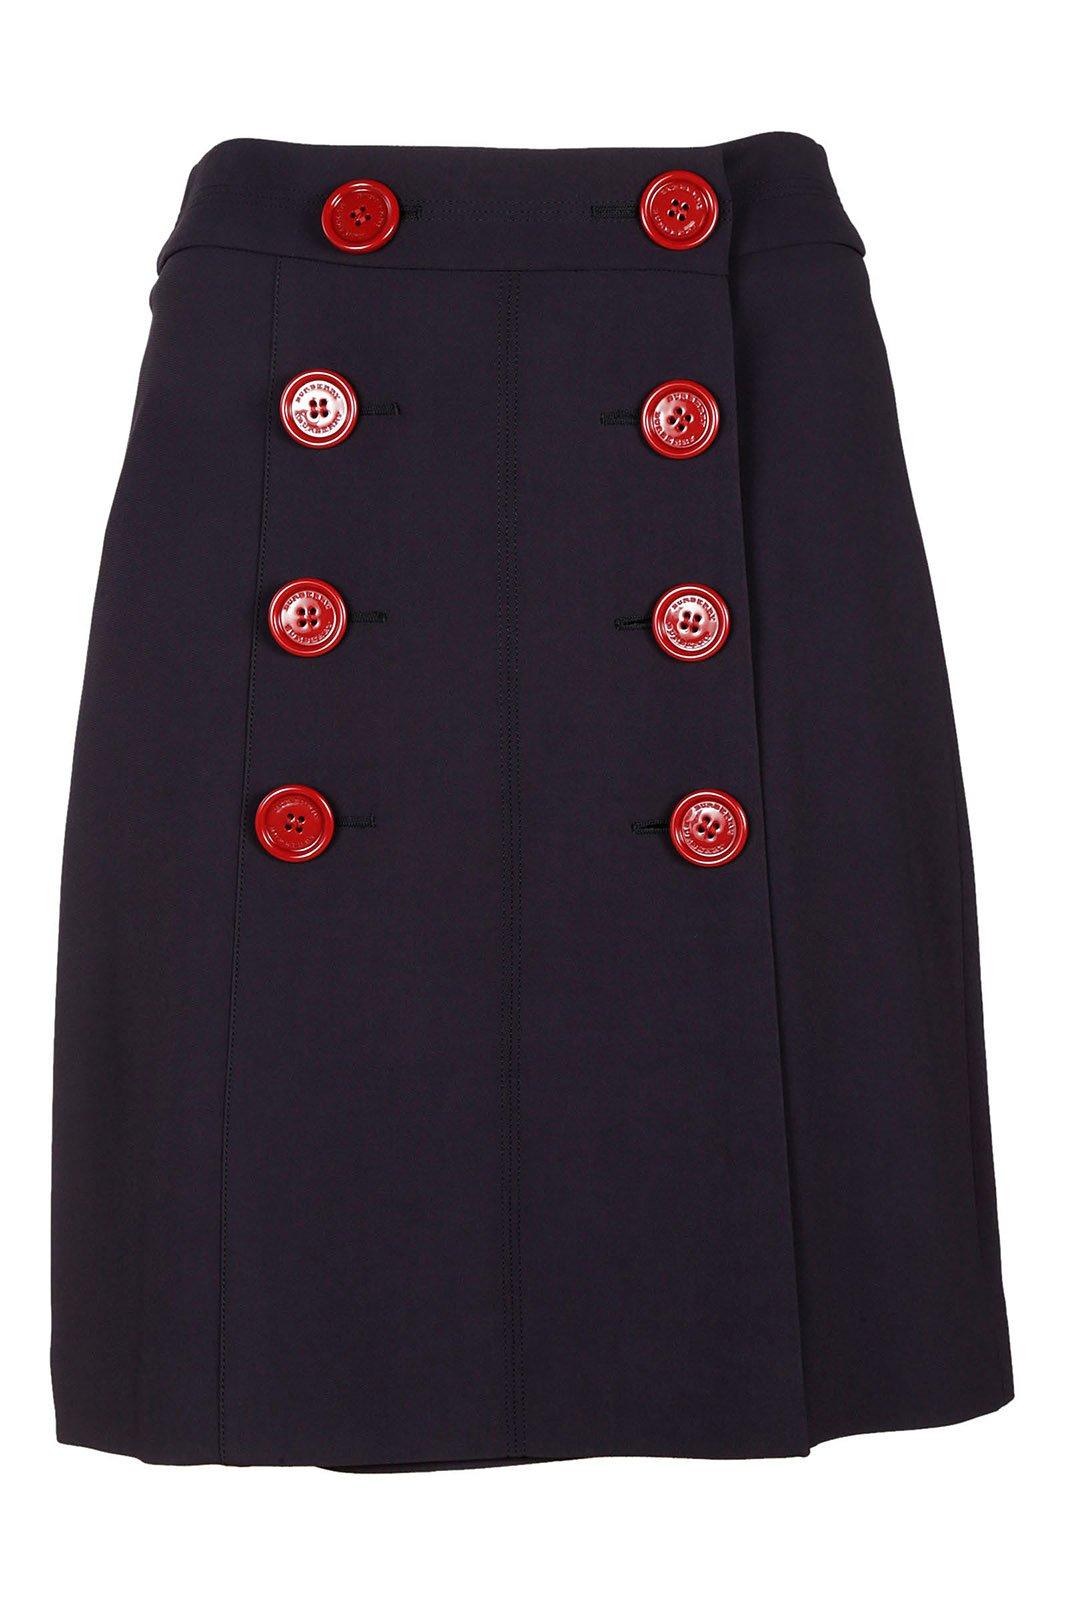 Burberry Women's Skirt Mini Short Blu US Size 4 (US 2) 40563071